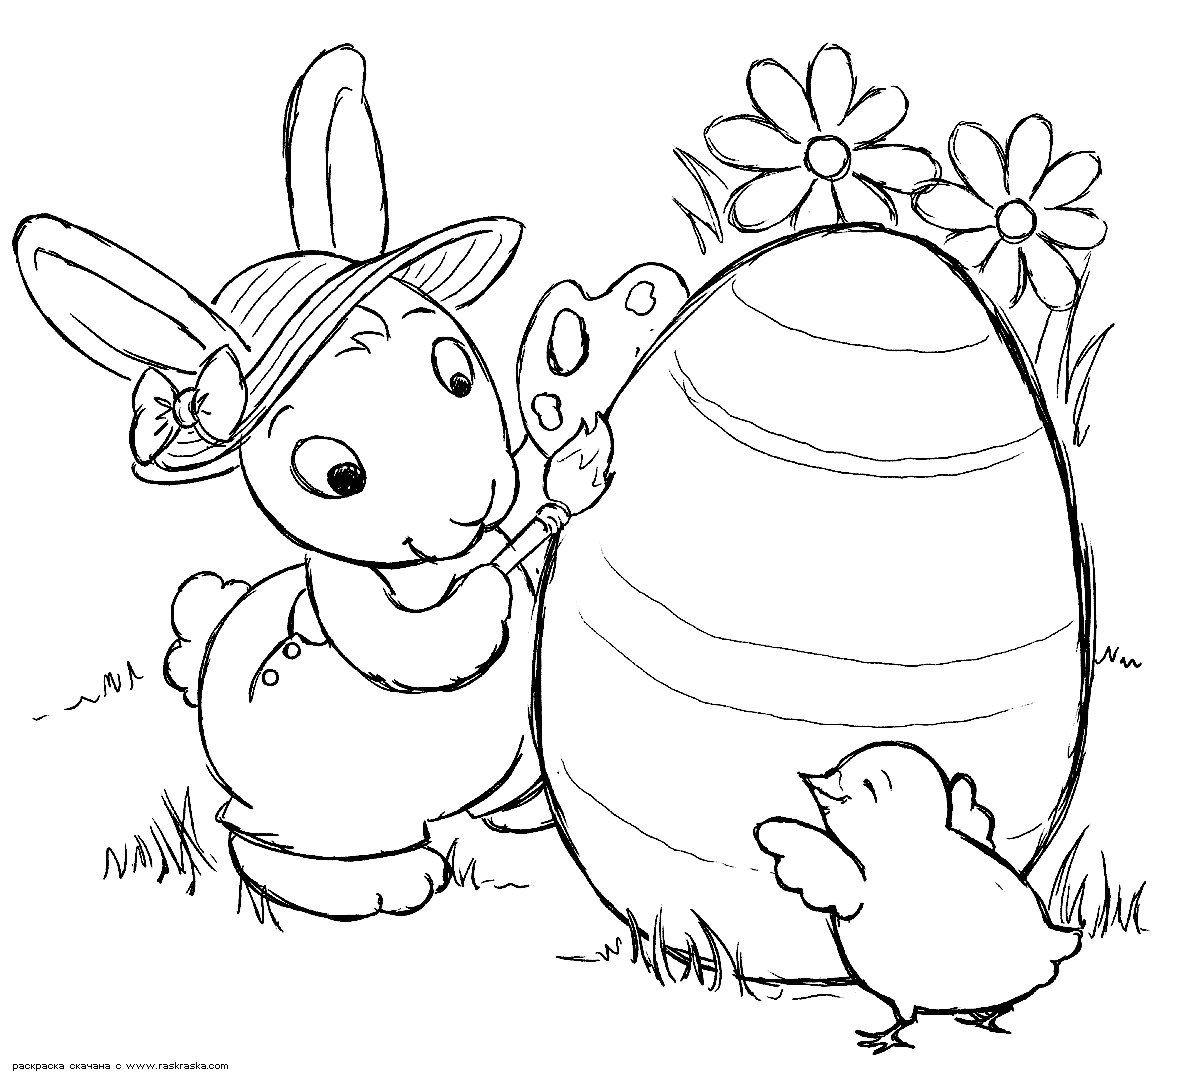 ПАСХАЛЬНЫЕ РАСКРАСКИ | Bunny coloring pages, Easter bunny ...